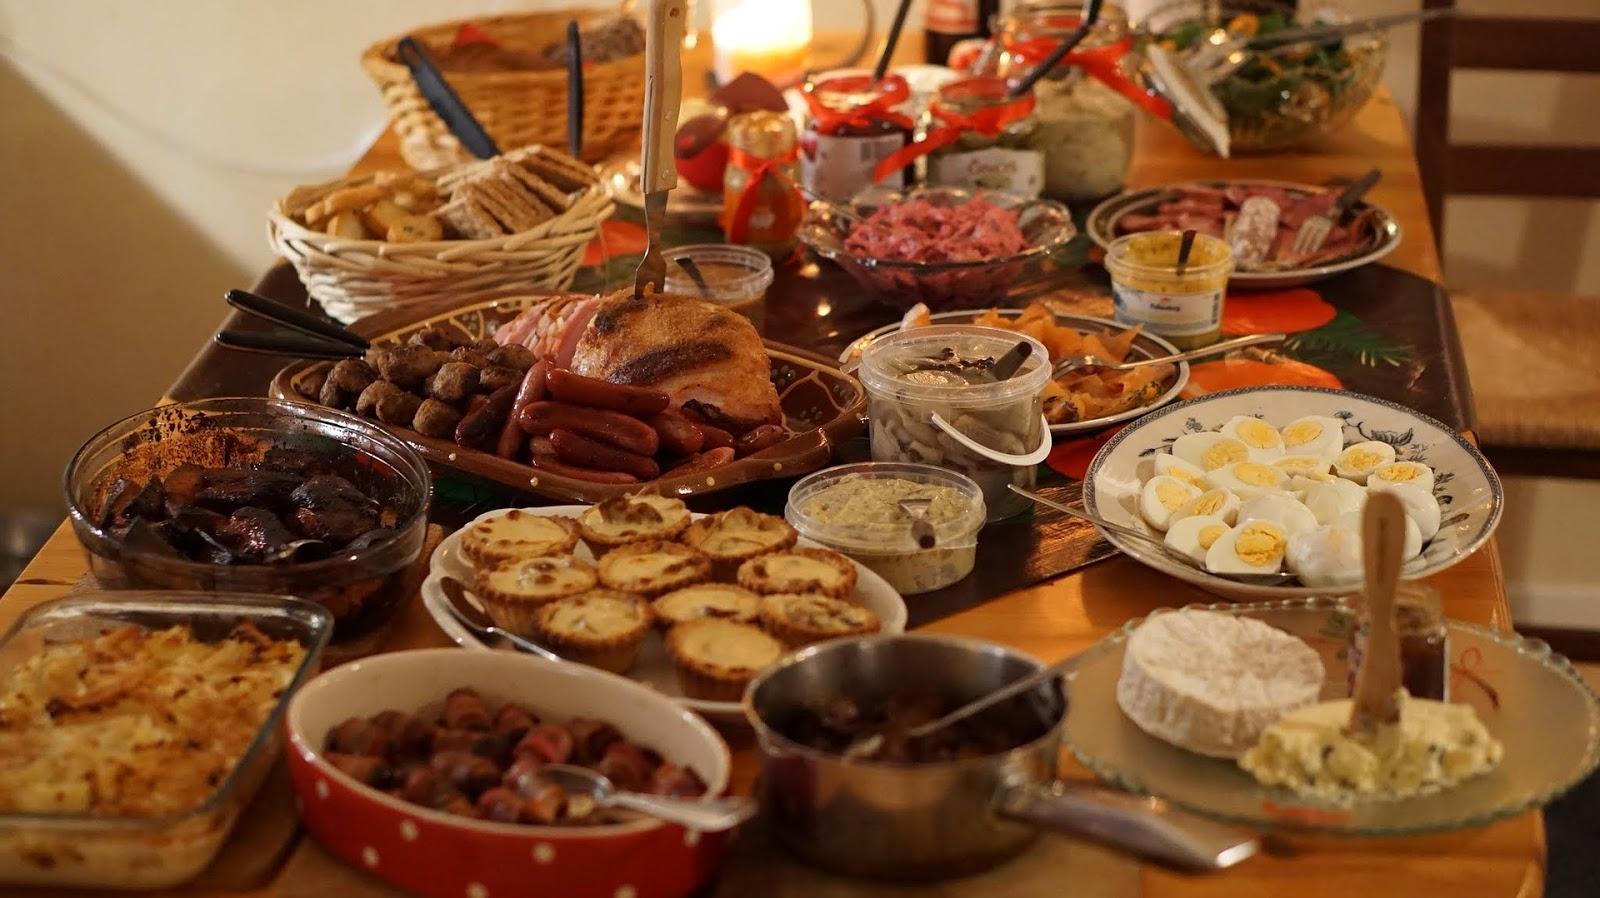 Buffet Natalizio Cookaround : Ricette buffet natalizio: menu buffet natalizio finger food salati e